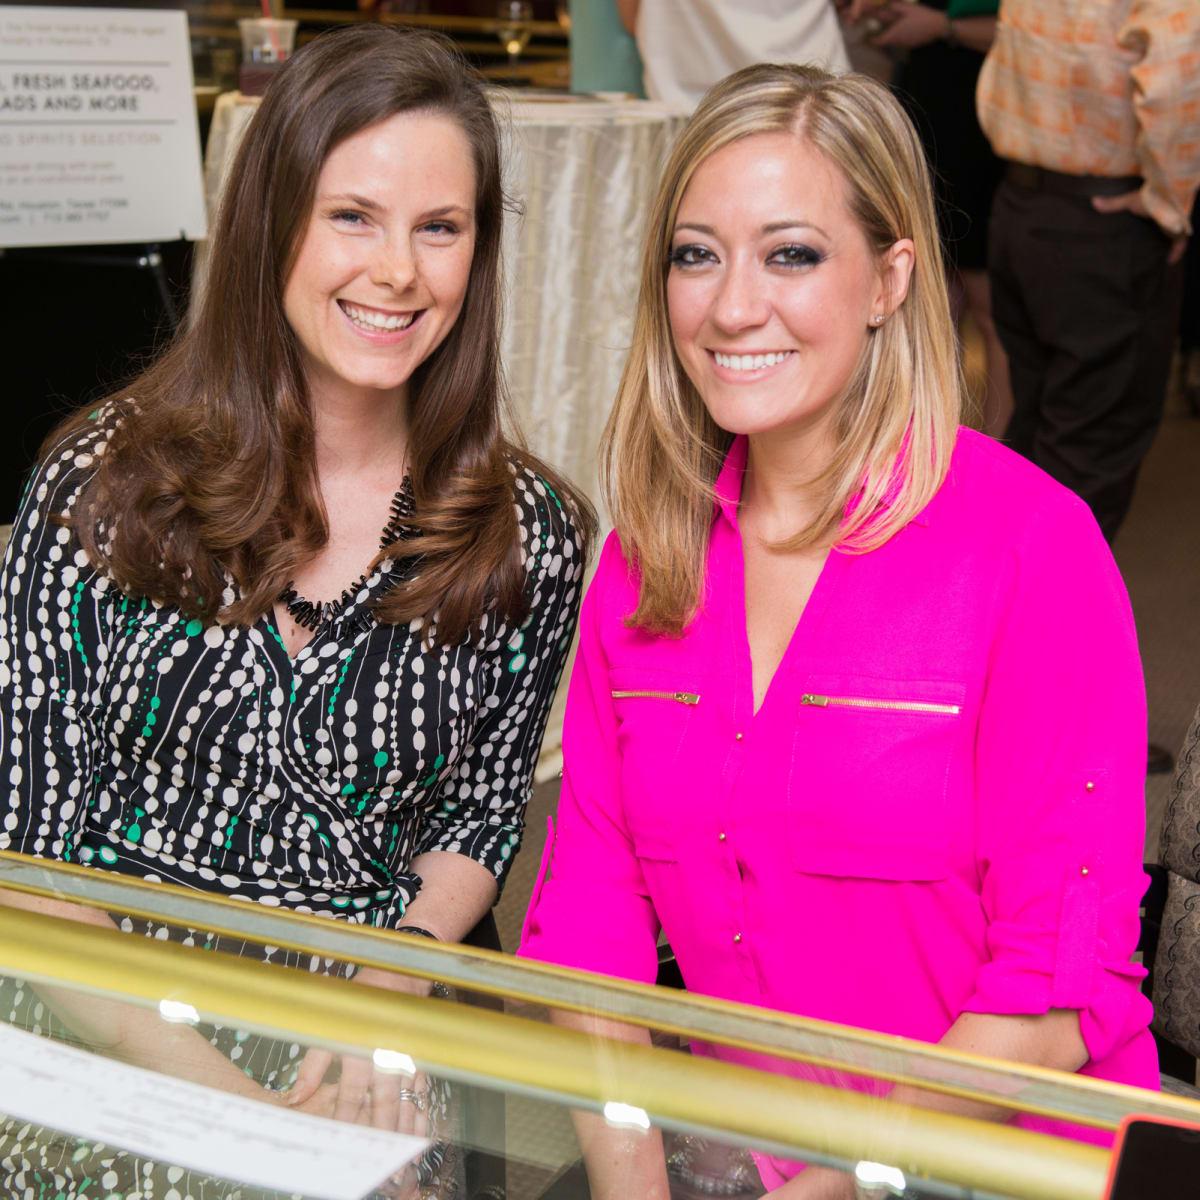 News, Shelby, IW Marks party, Sept. 2015, Chantall Stillmar, Rebecca Payne